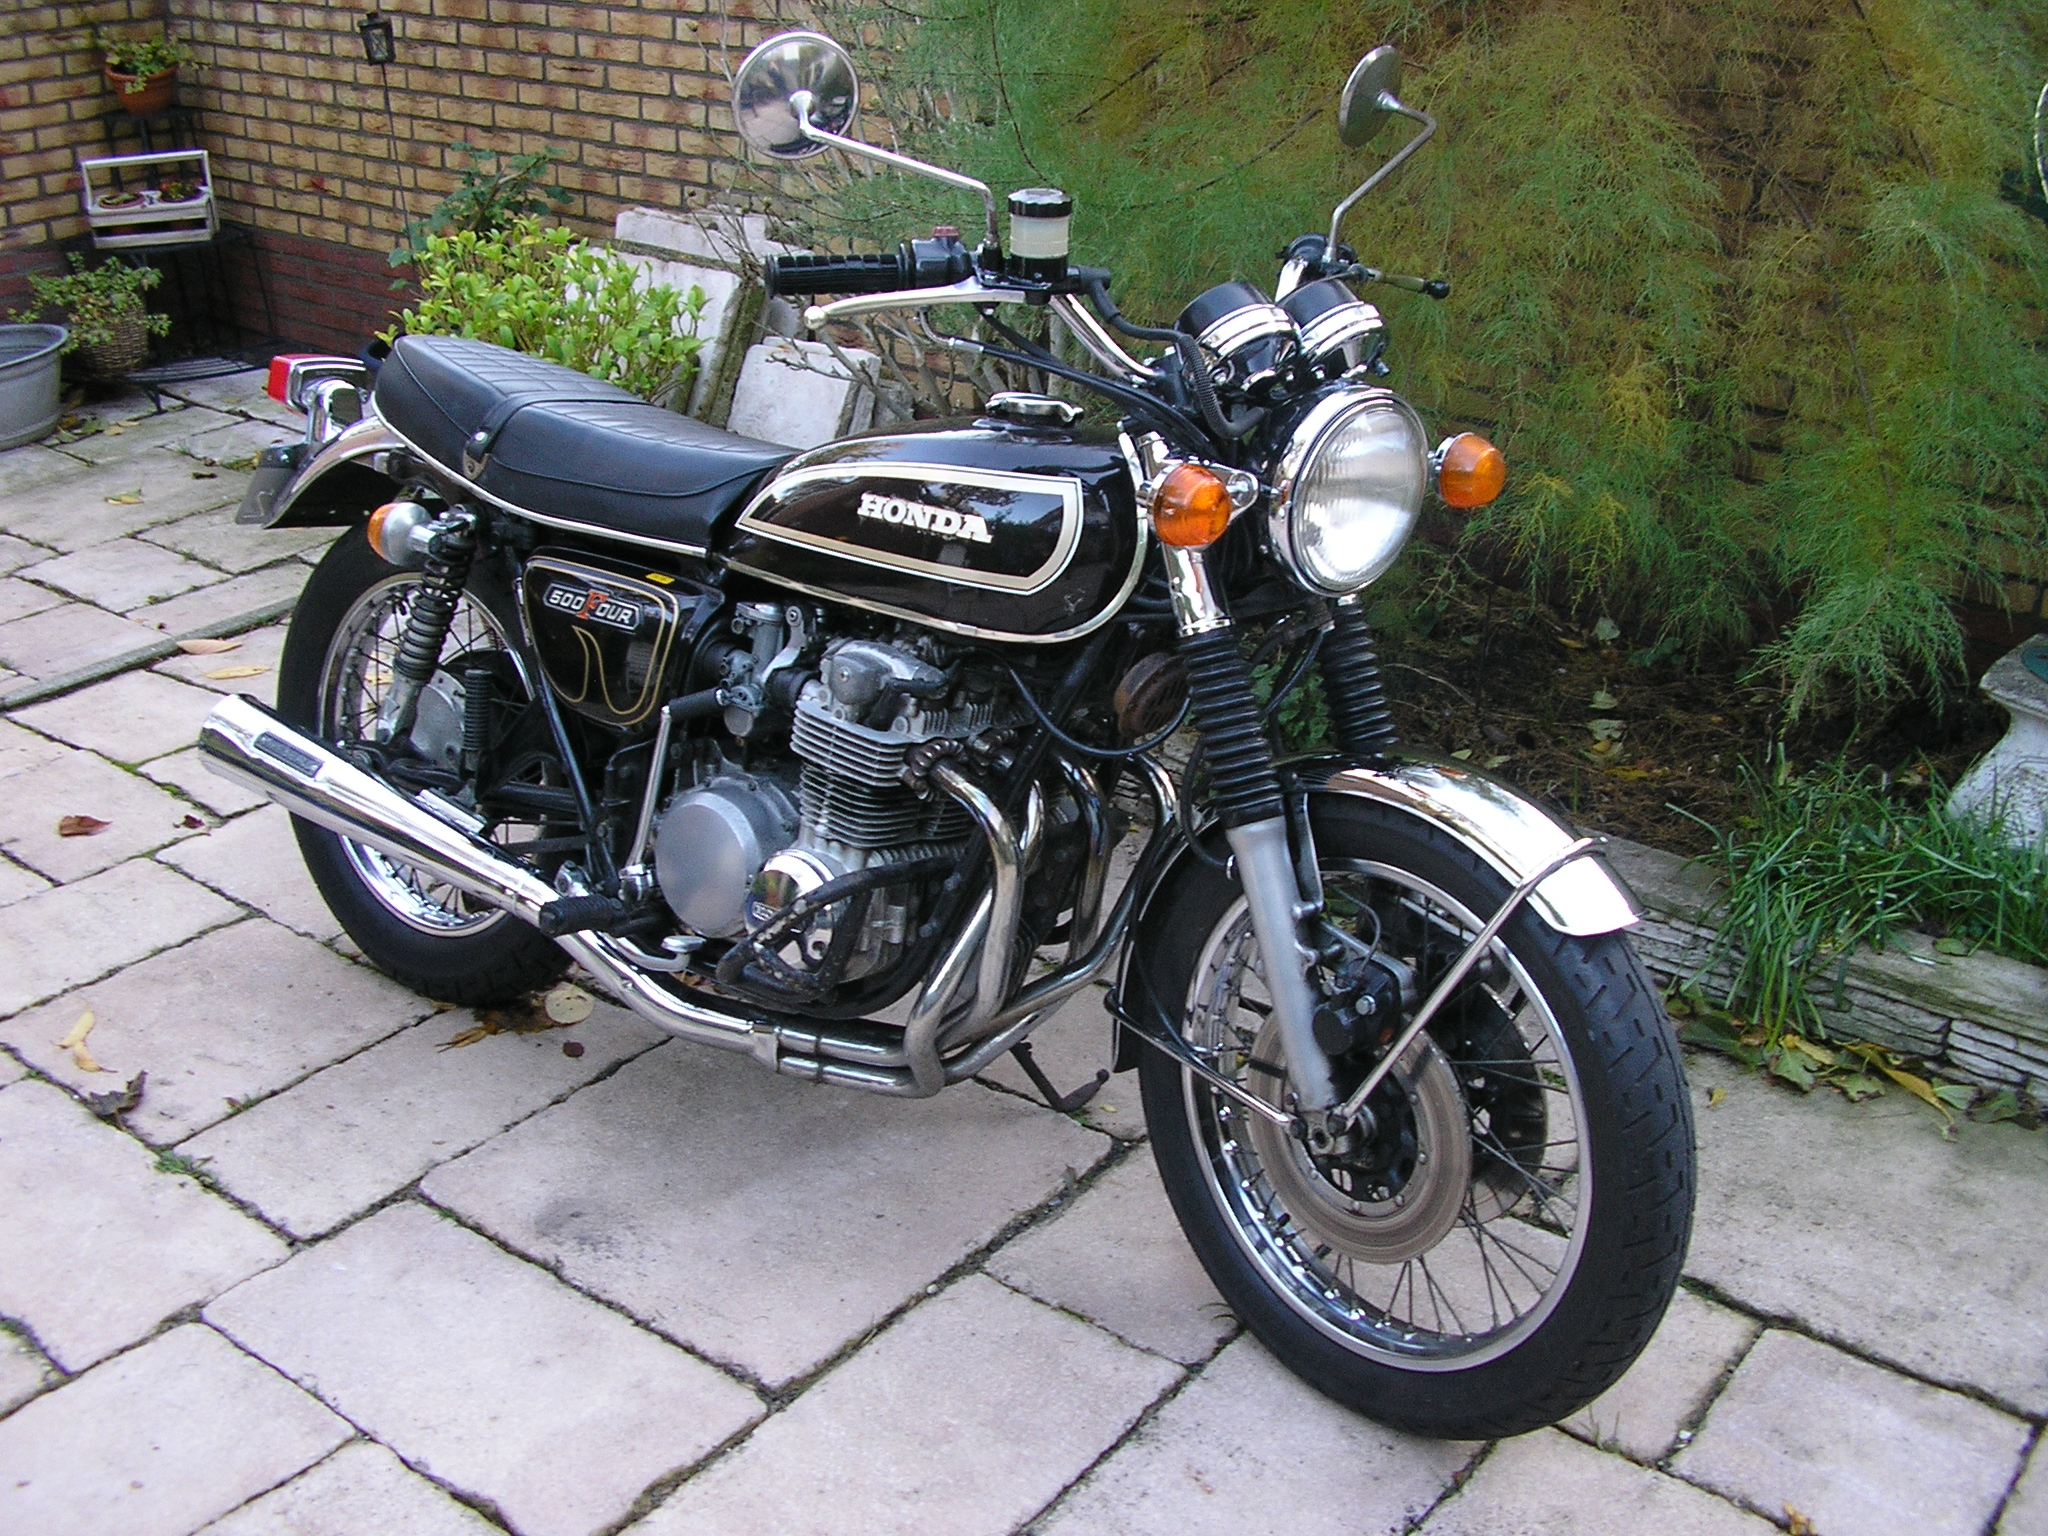 cb500 gallery classic motorbikes. Black Bedroom Furniture Sets. Home Design Ideas